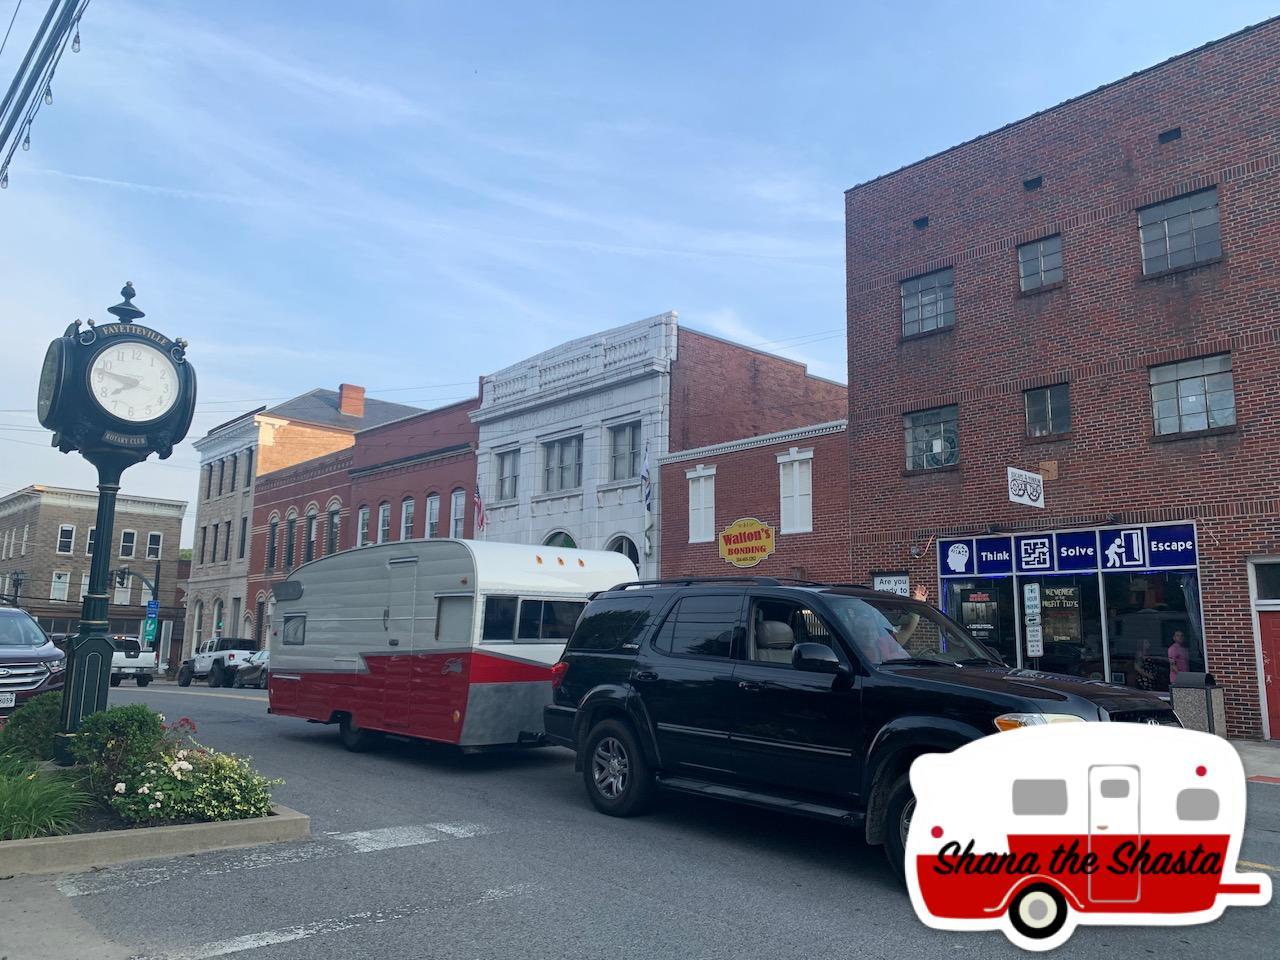 Shana-in-Downtown-Fayetteville-West-Virginia